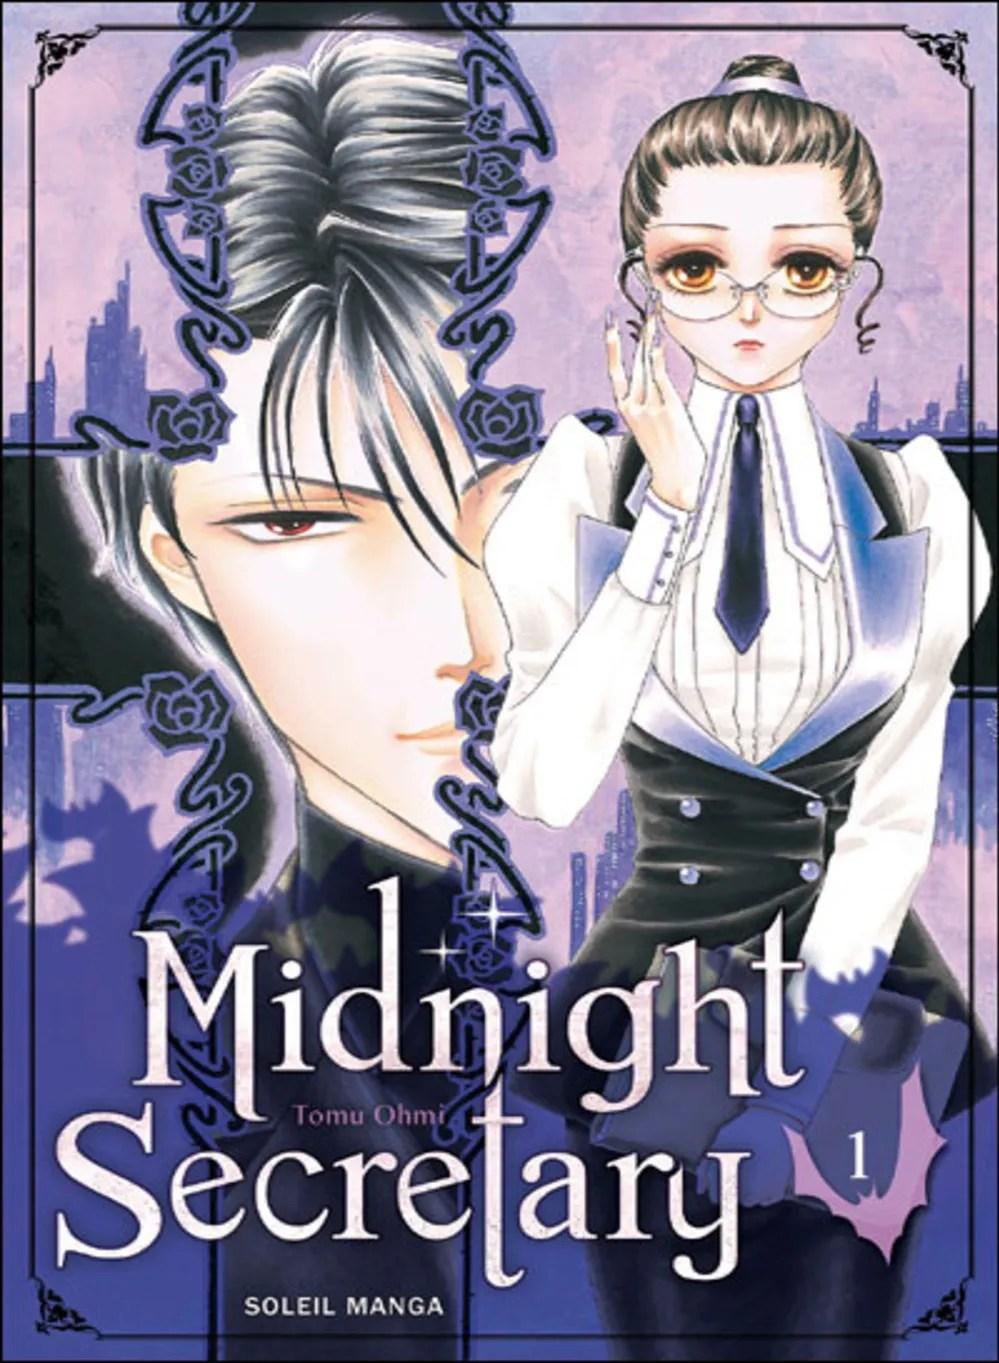 Image result for midnight secretary manga